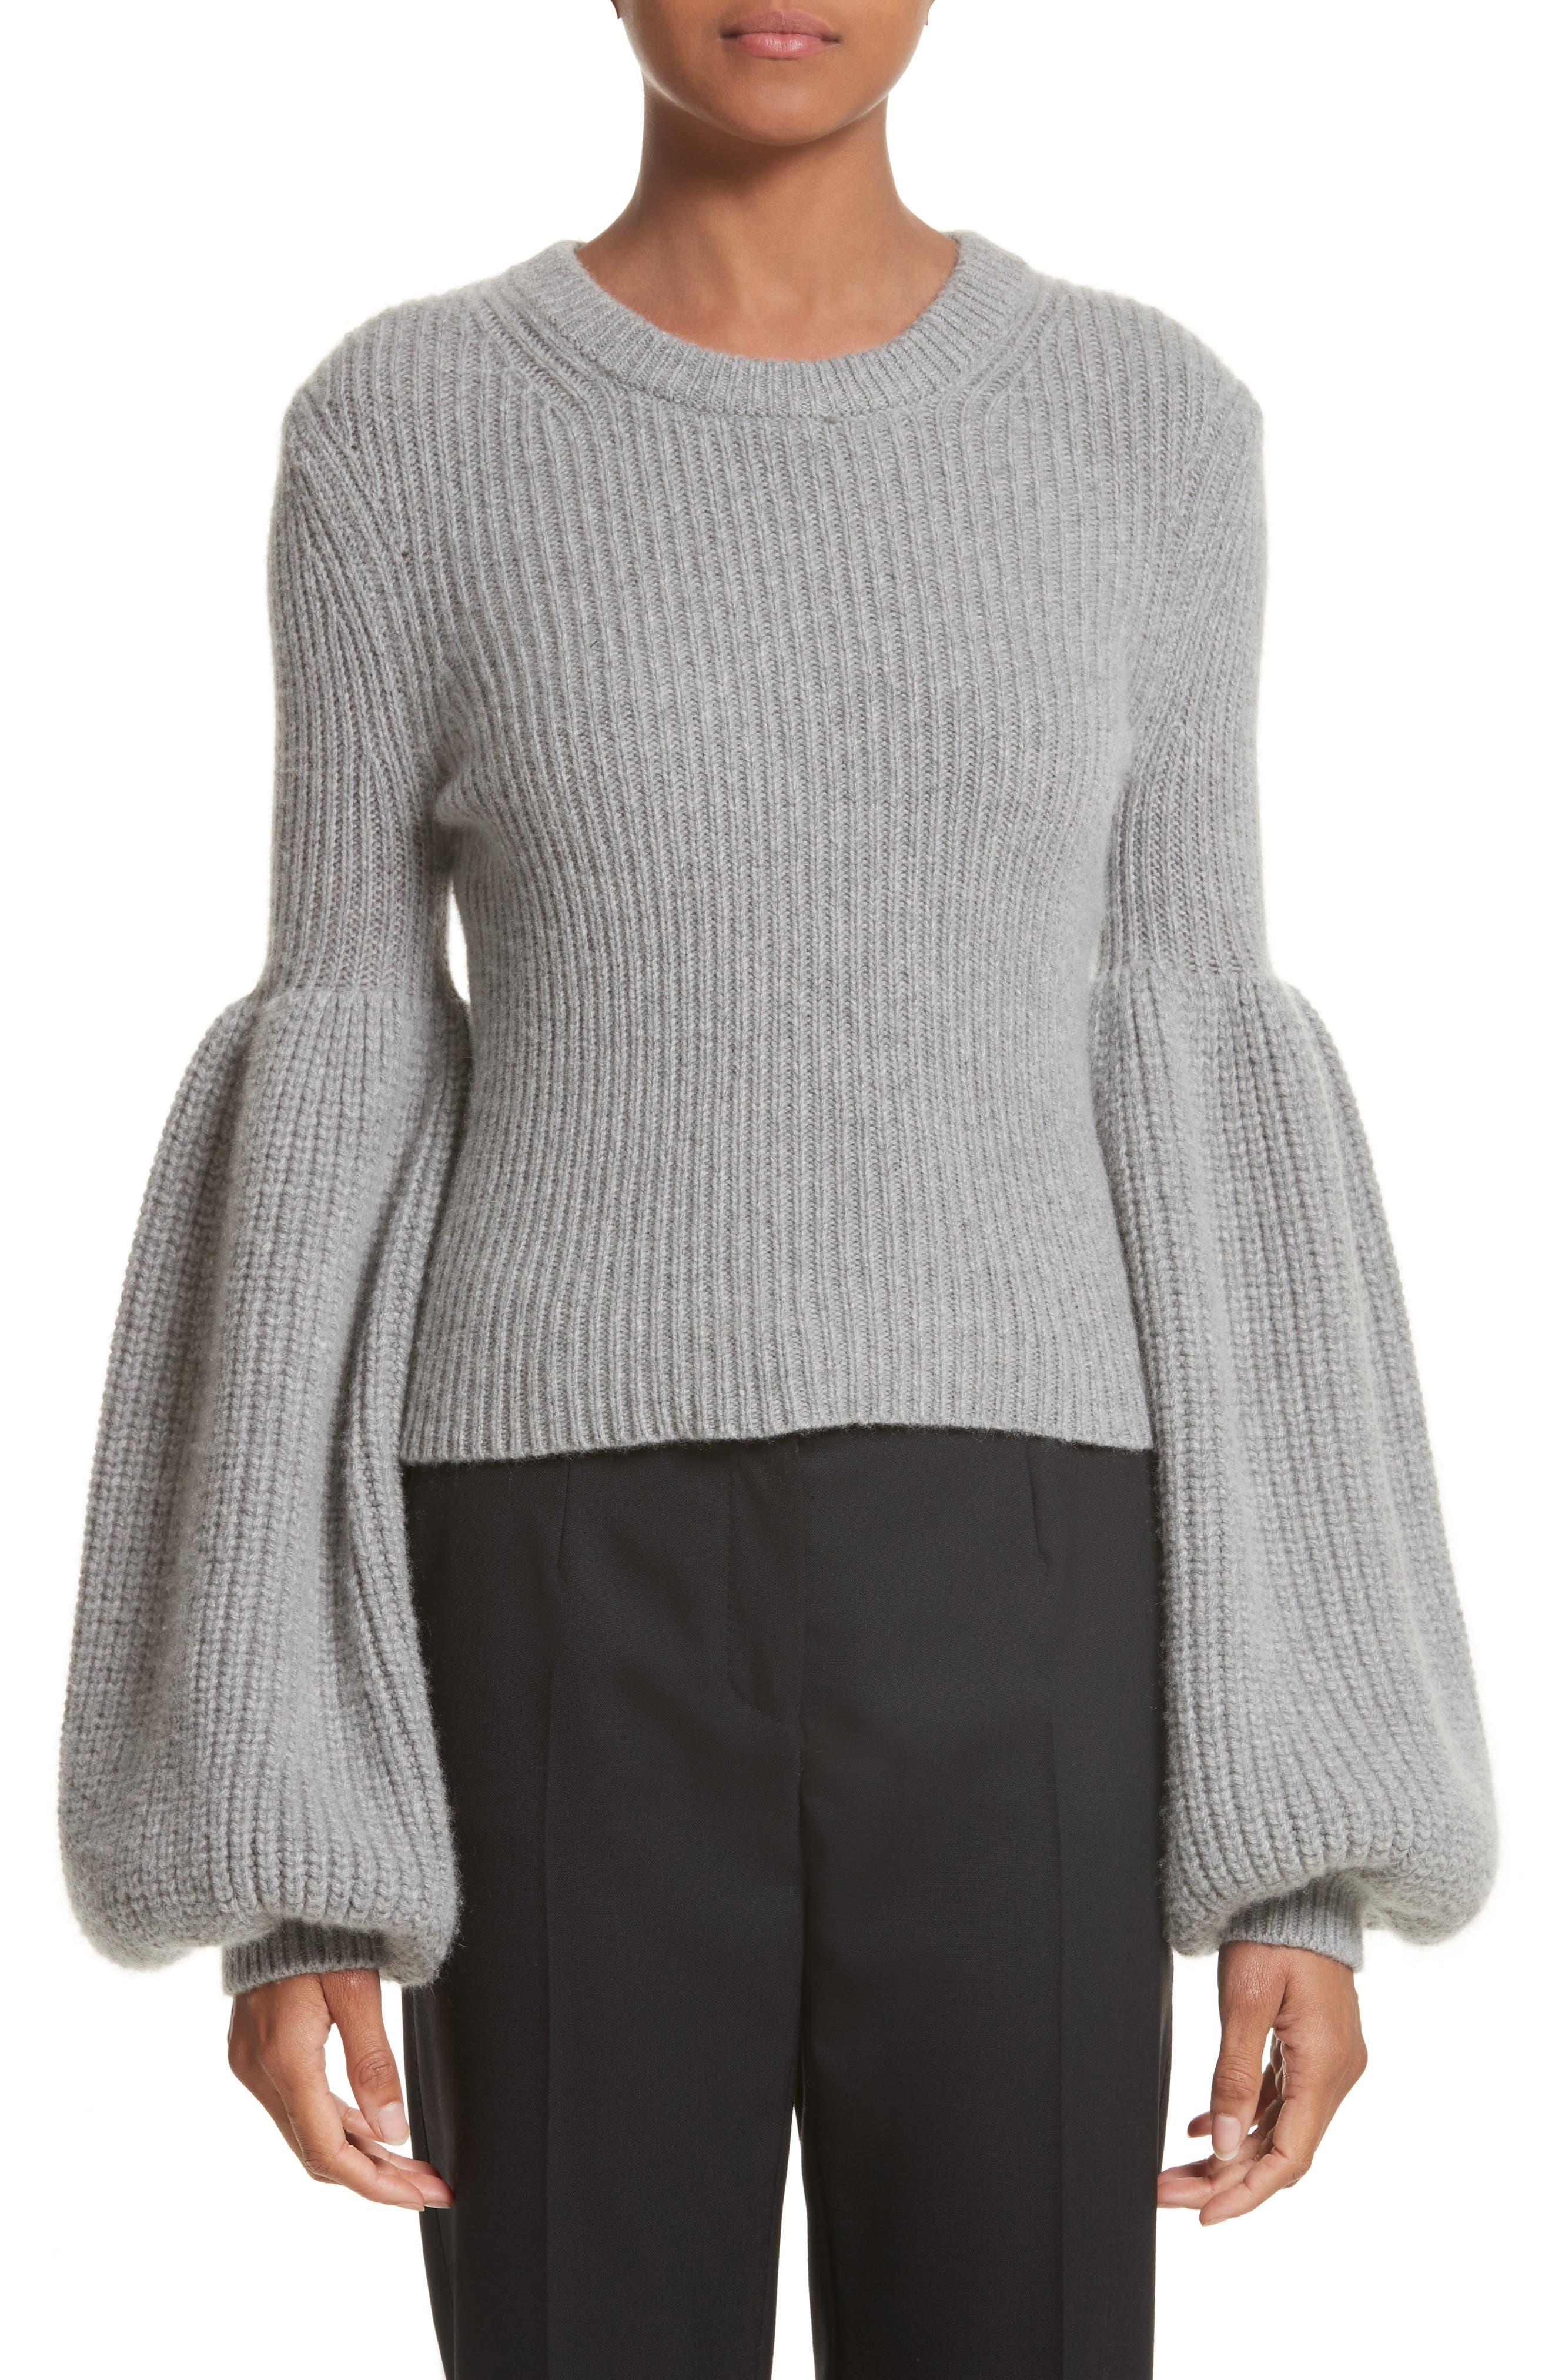 Alternate Image 1 Selected - Alexander Wang Puff Lantern Sleeve Wool & Cashmere Blend Sweater